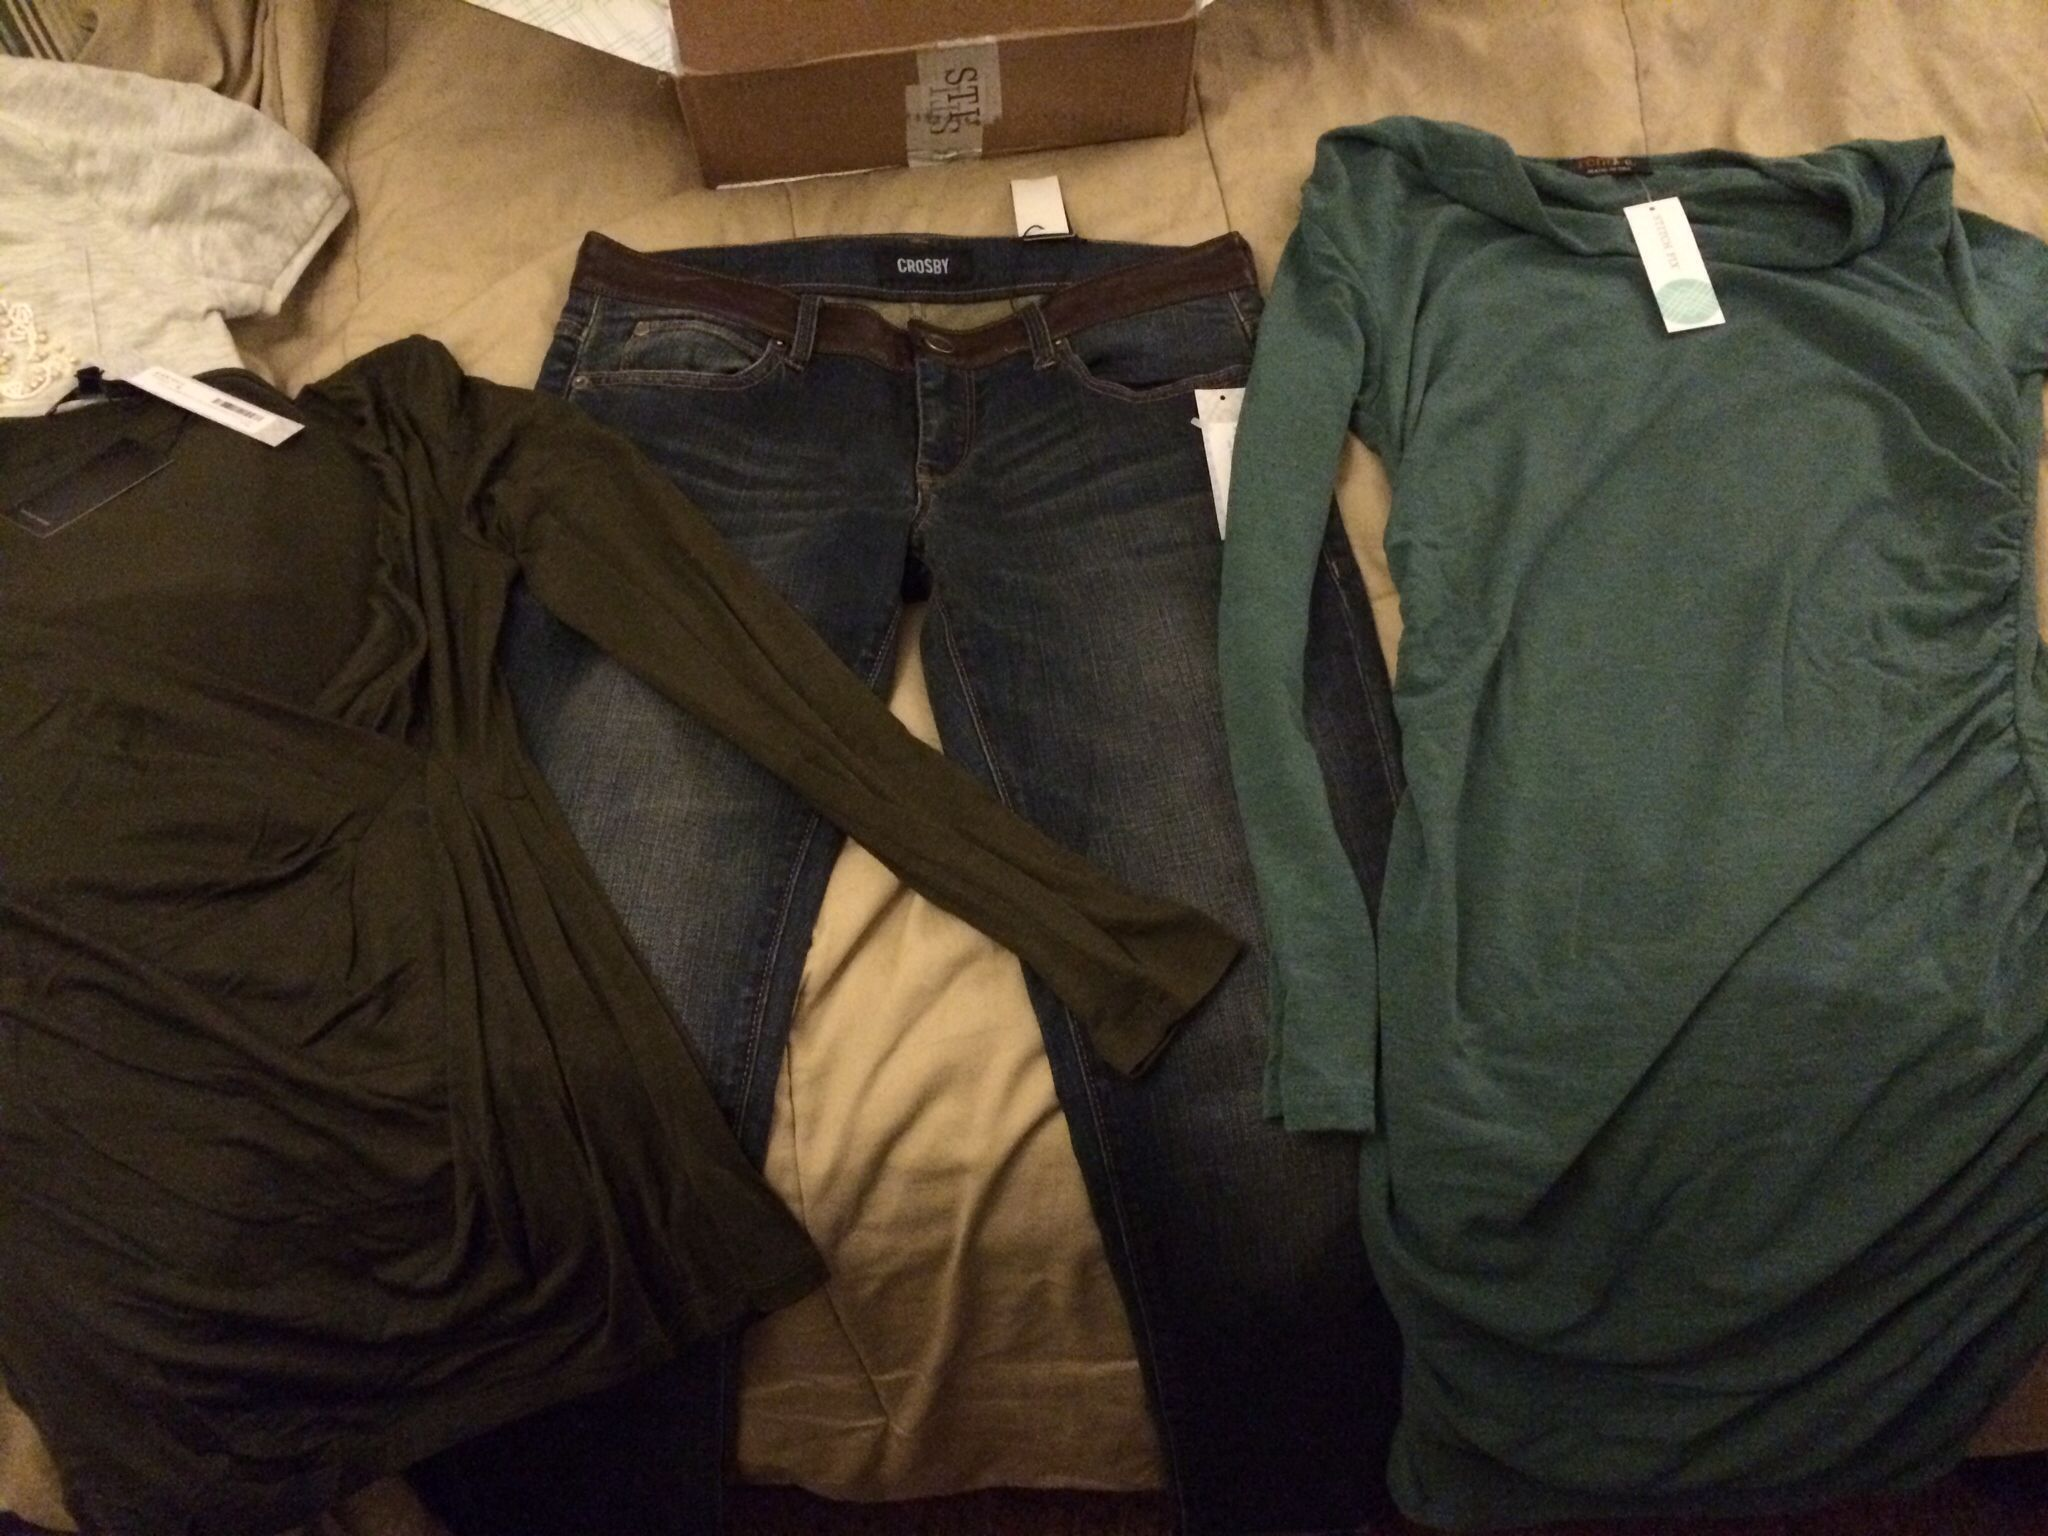 Tart to, Crosby skinny jeans, Renne C cowl dress